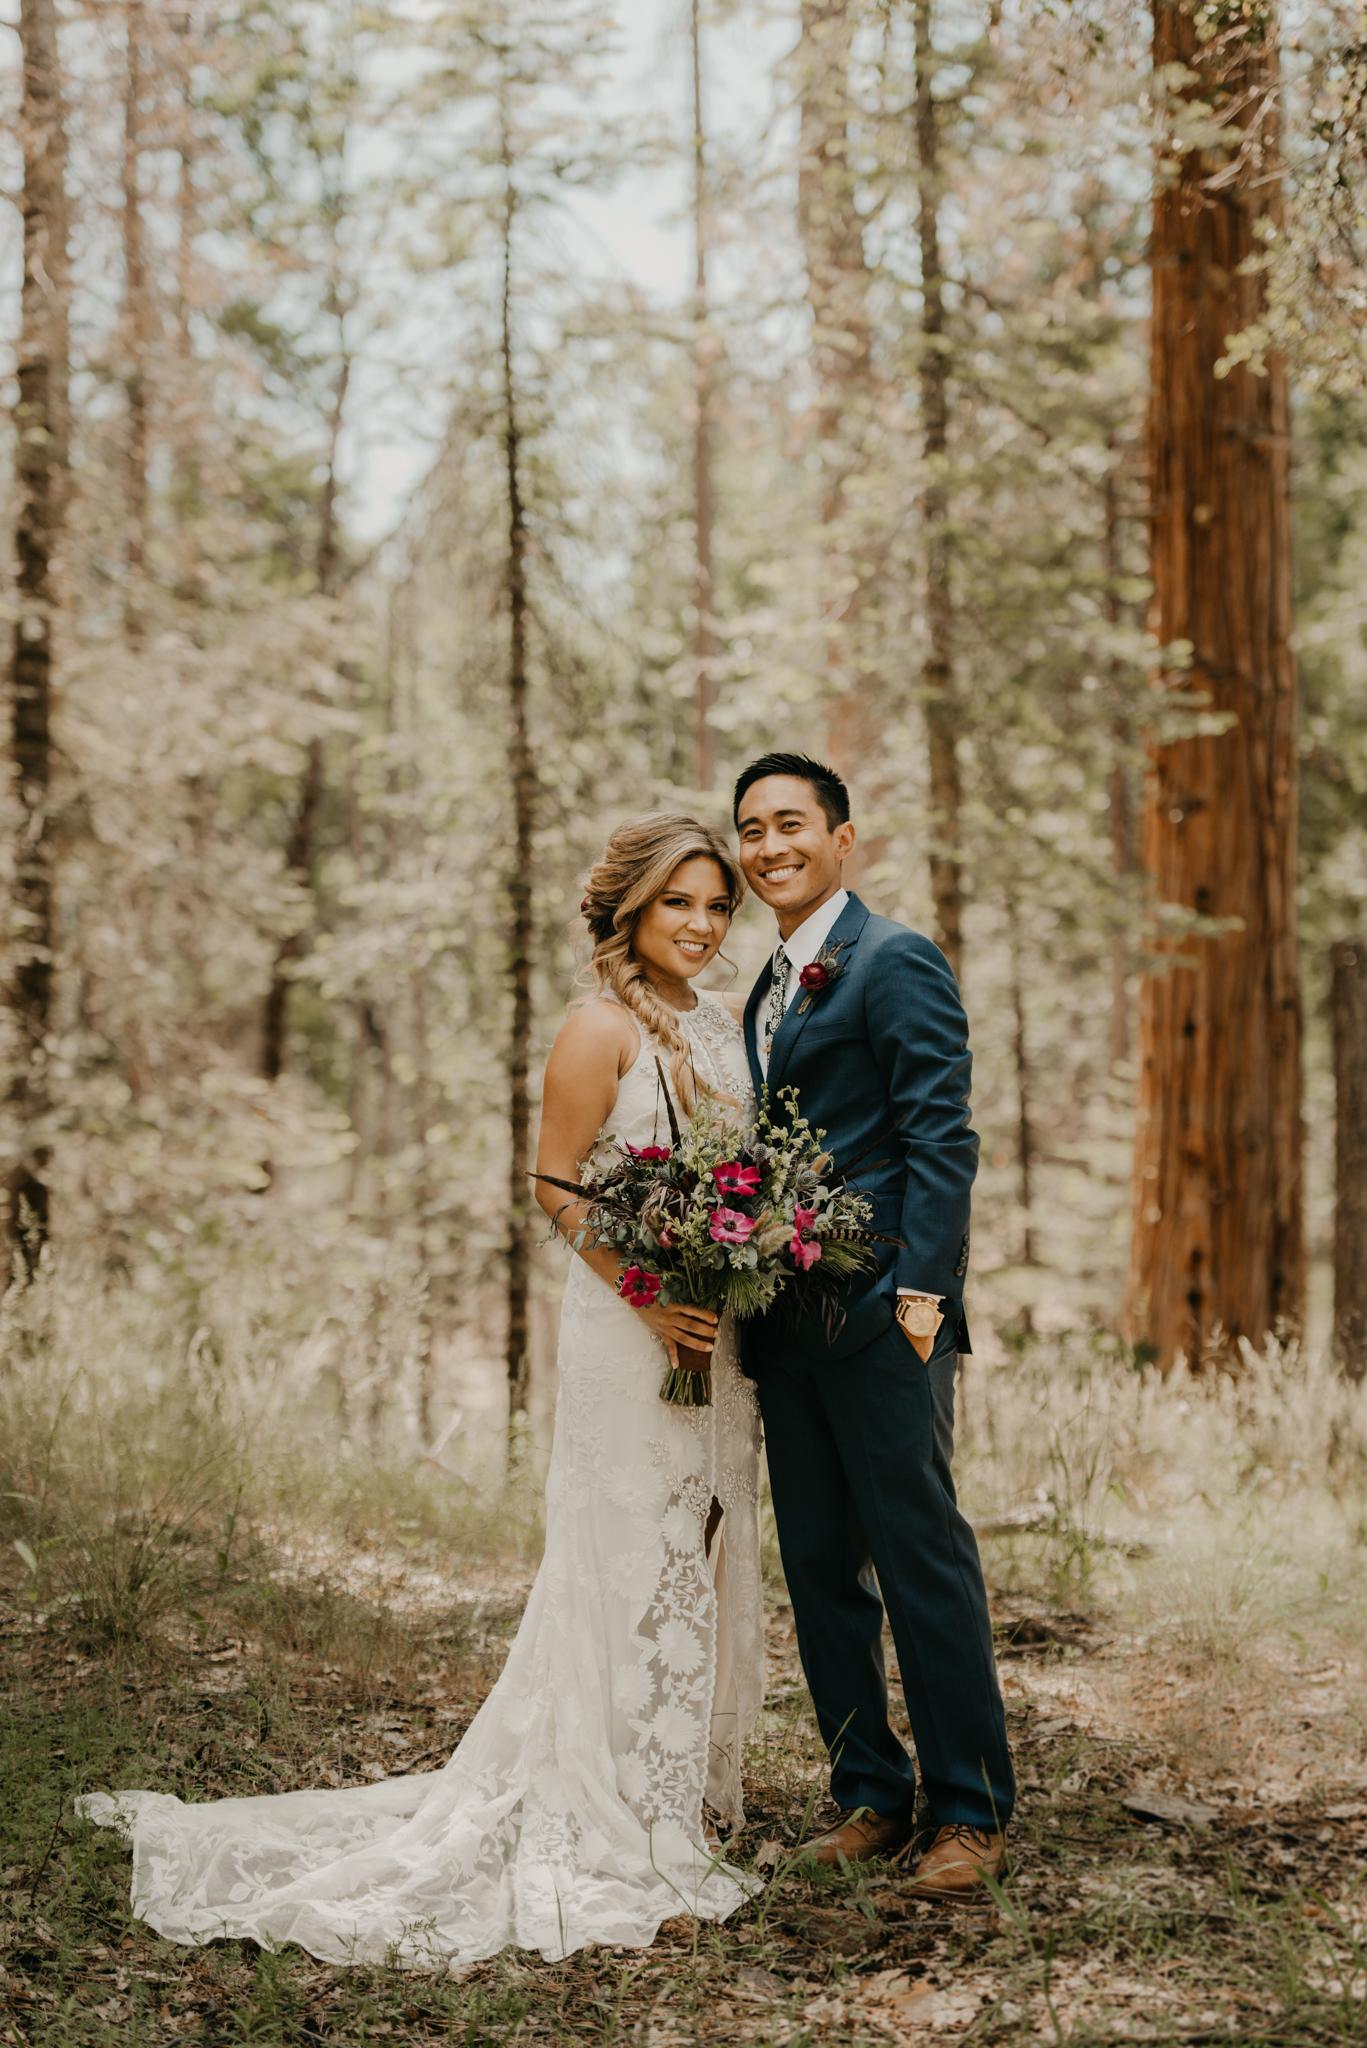 © Isaiah + Taylor Photography - Evergreen Lodge Destination Yoesmite Wedding - Los Angeles Wedding Photographer-076.jpg